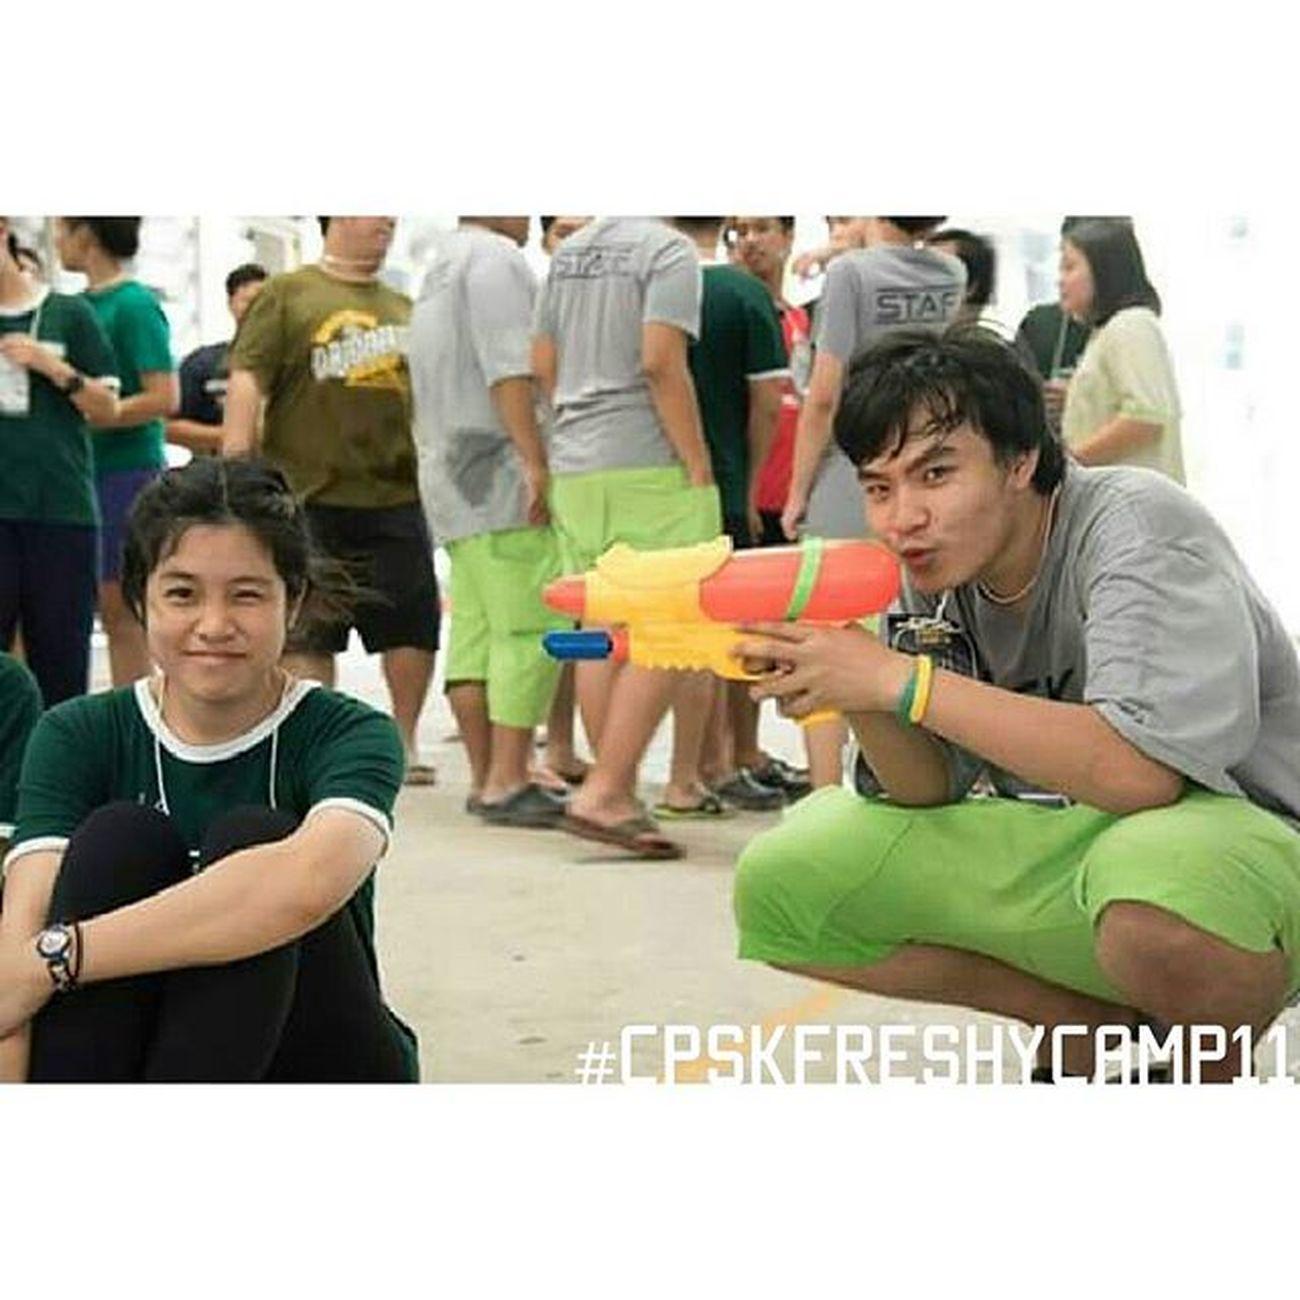 C P S K | f r e s h y | c a m p | 1 1 CPSKfreshycamp11